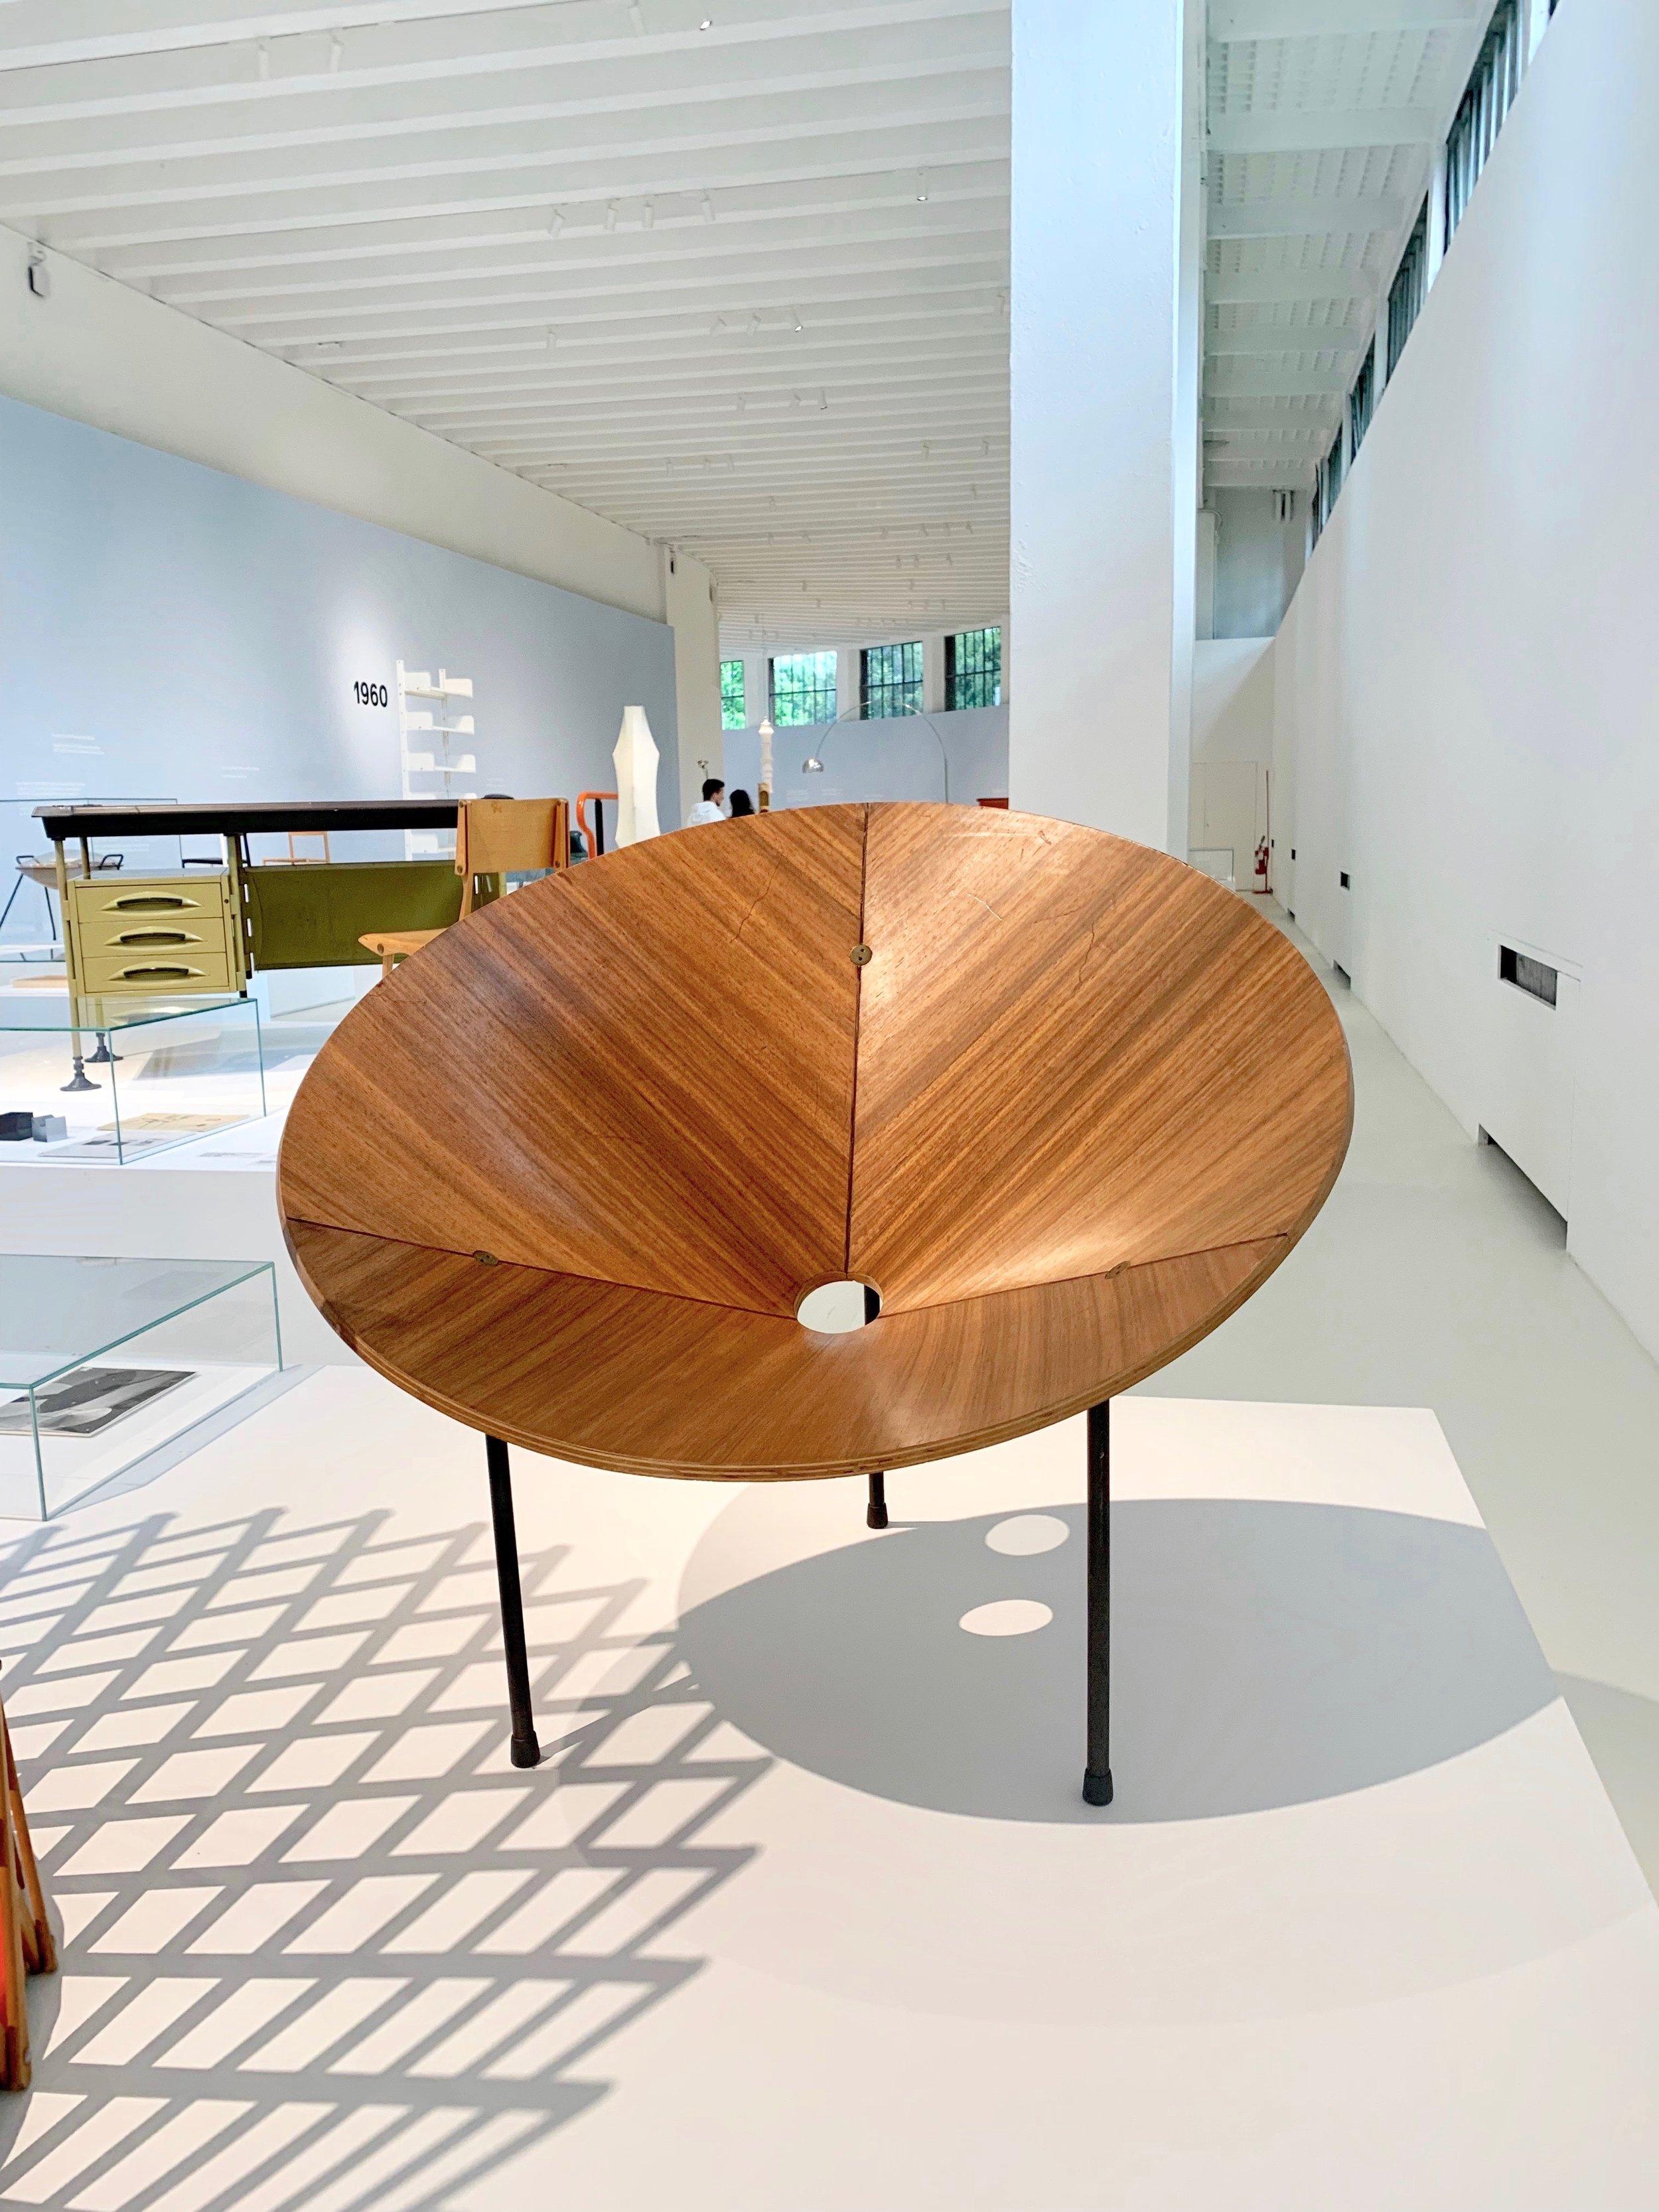 Museum Of Italian Design - Italian Mid Century Modern Furniture Designitalia00009.jpeg